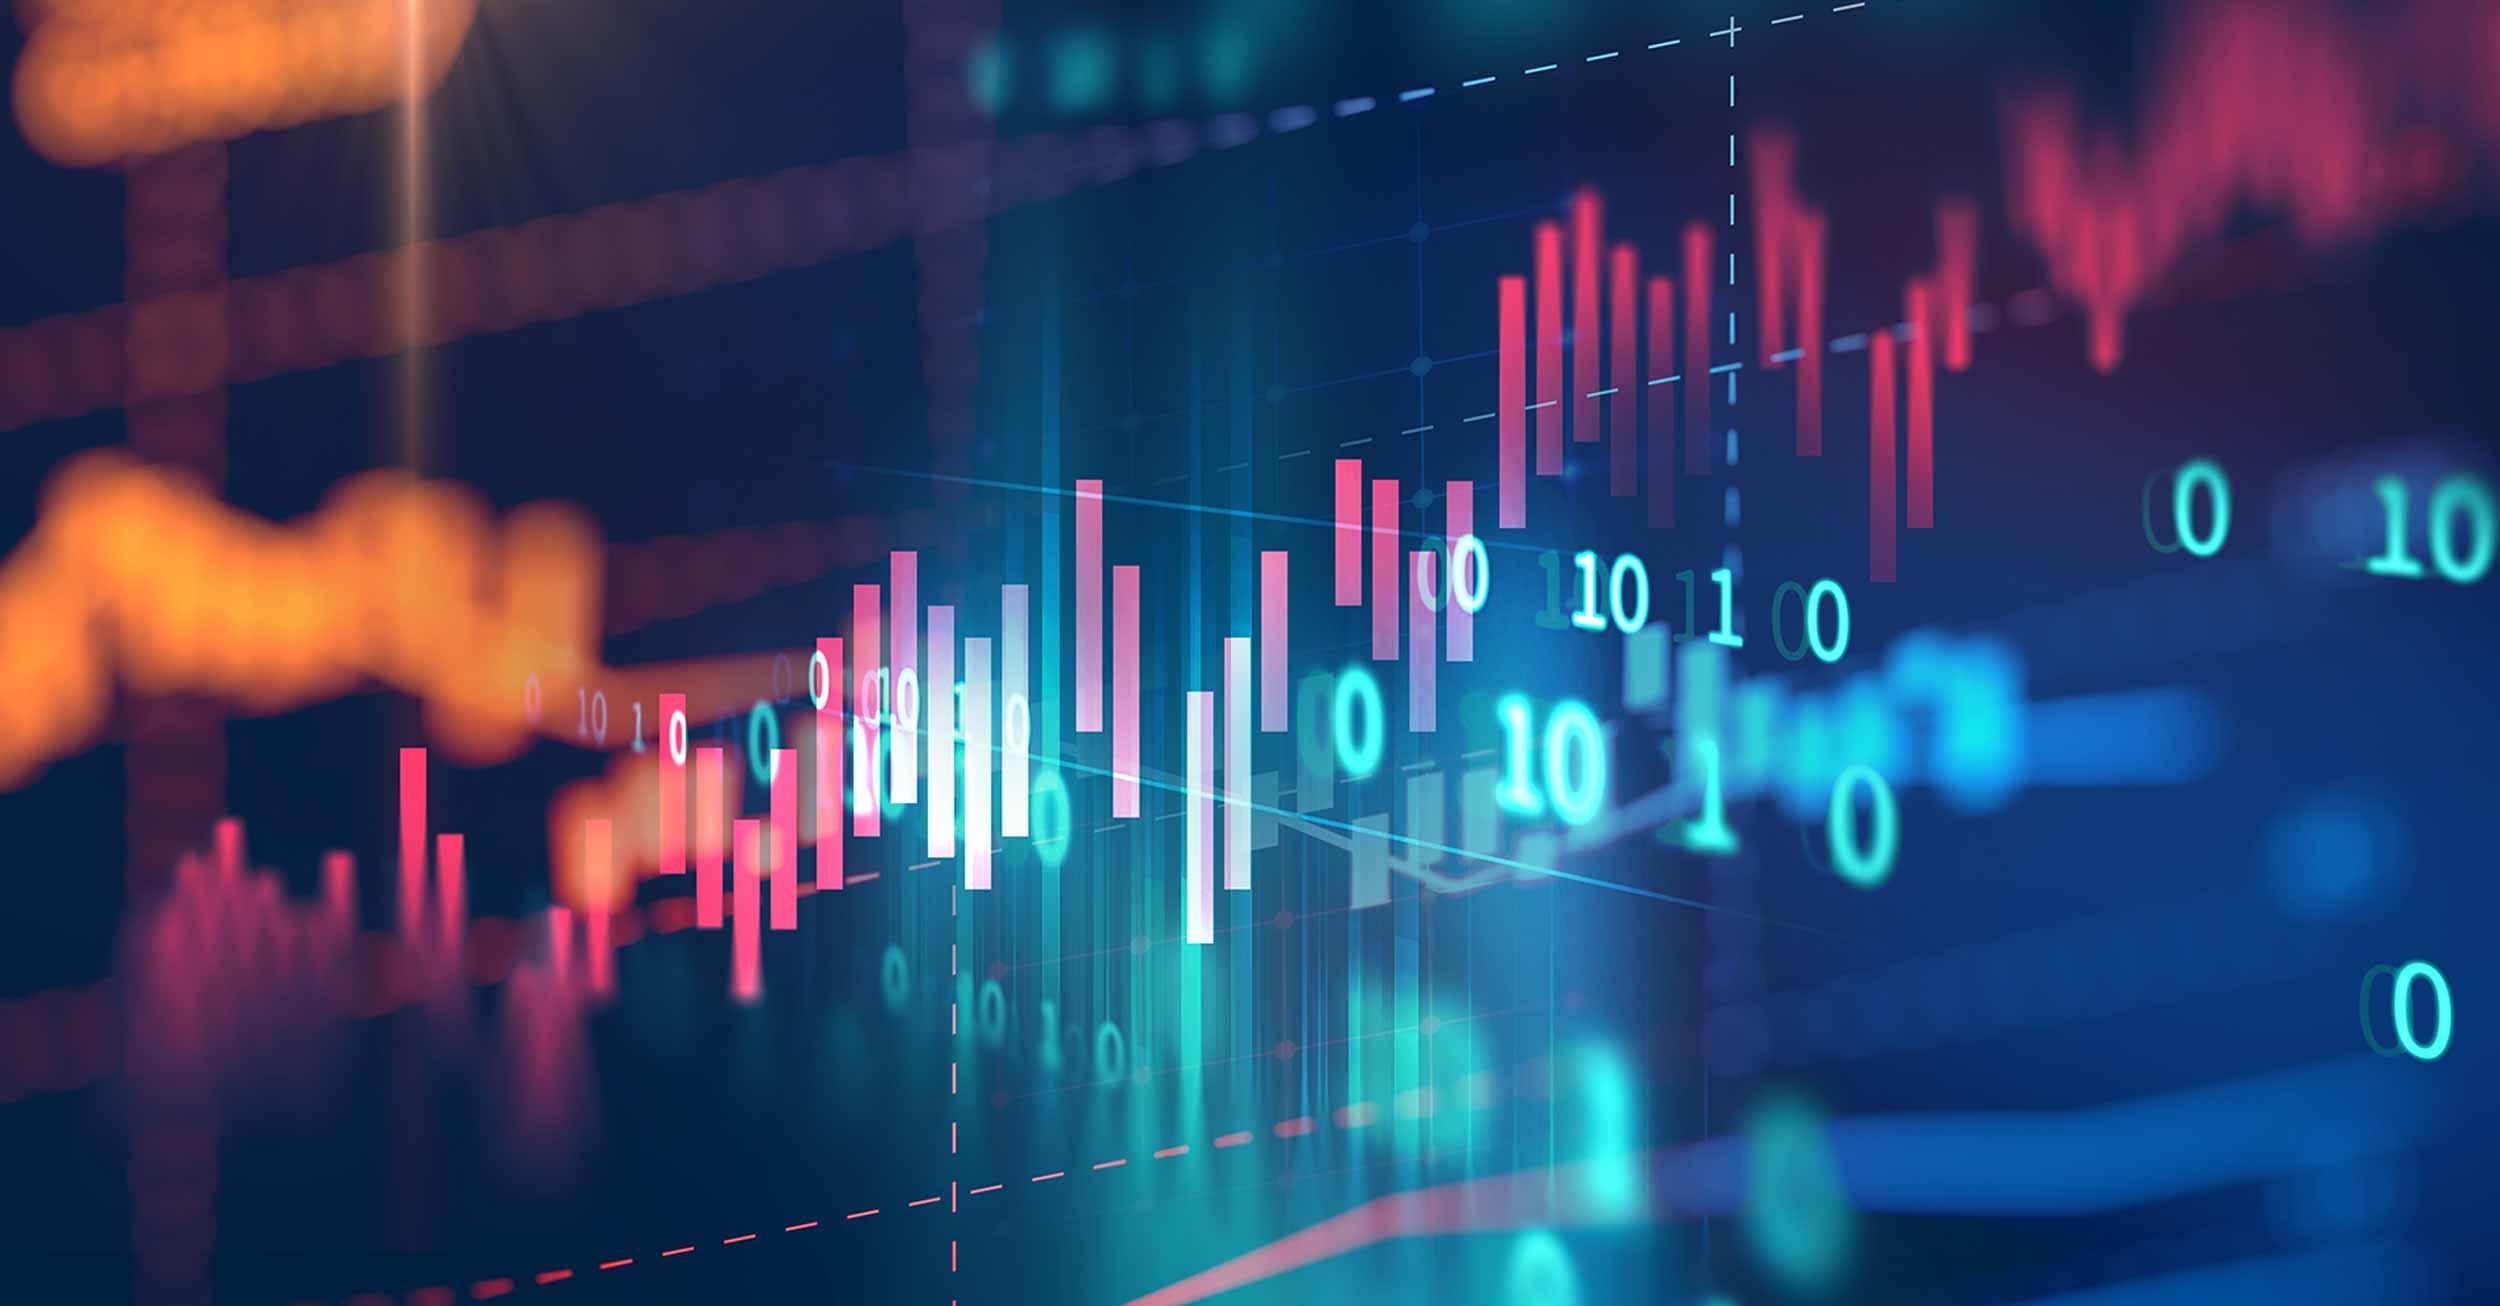 8 Trends Shaping Digital Marketing In 2021